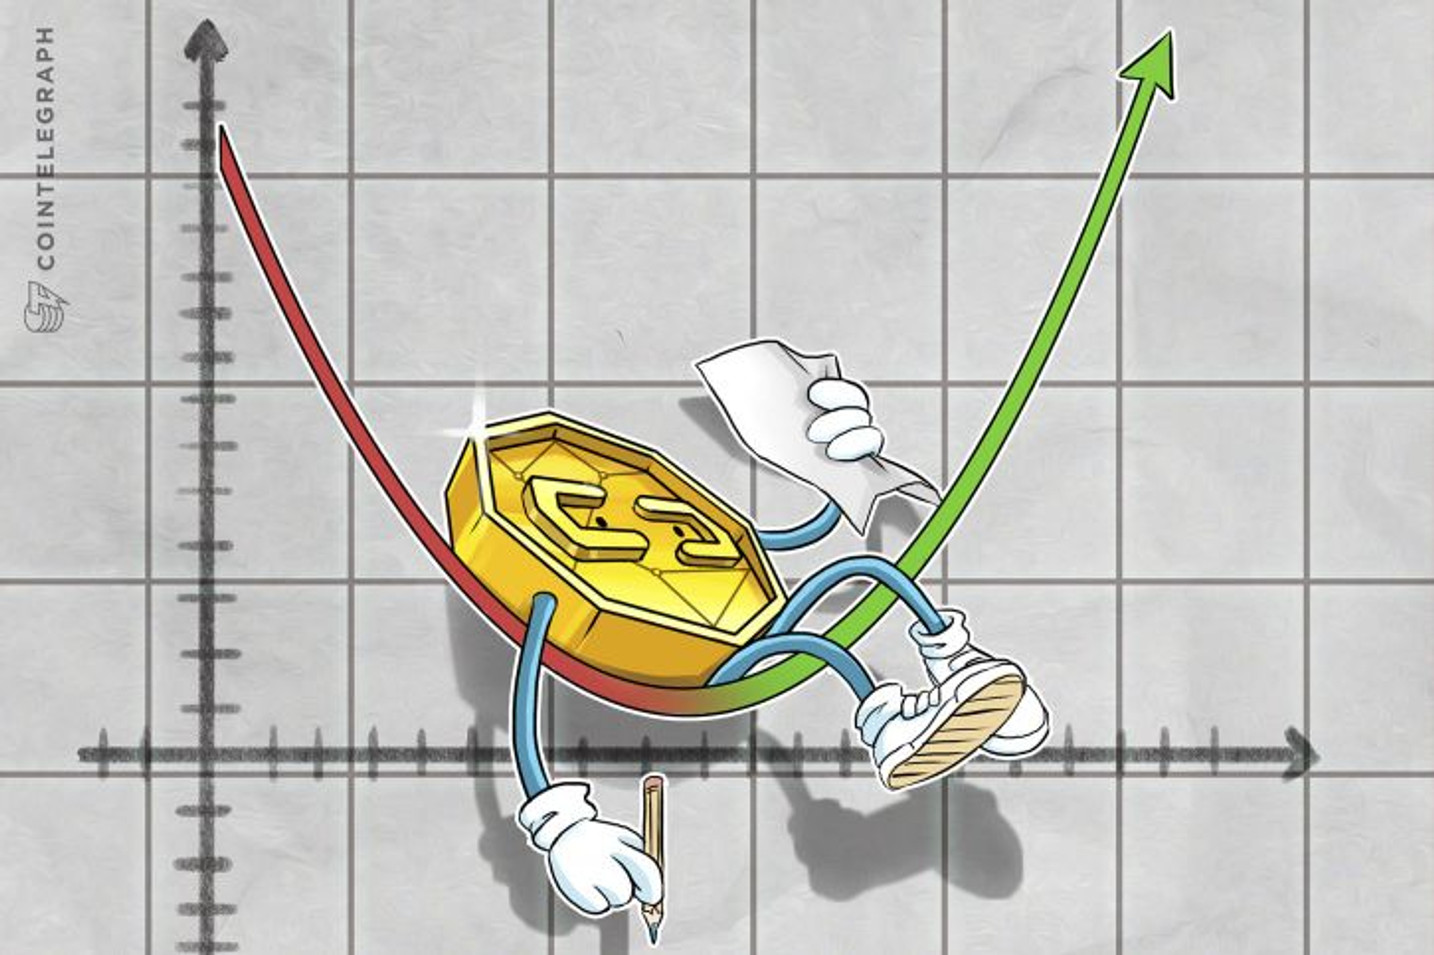 Bearish Markets See Only Slight Gains – BTC Still Below $7k, ETH Testing $500